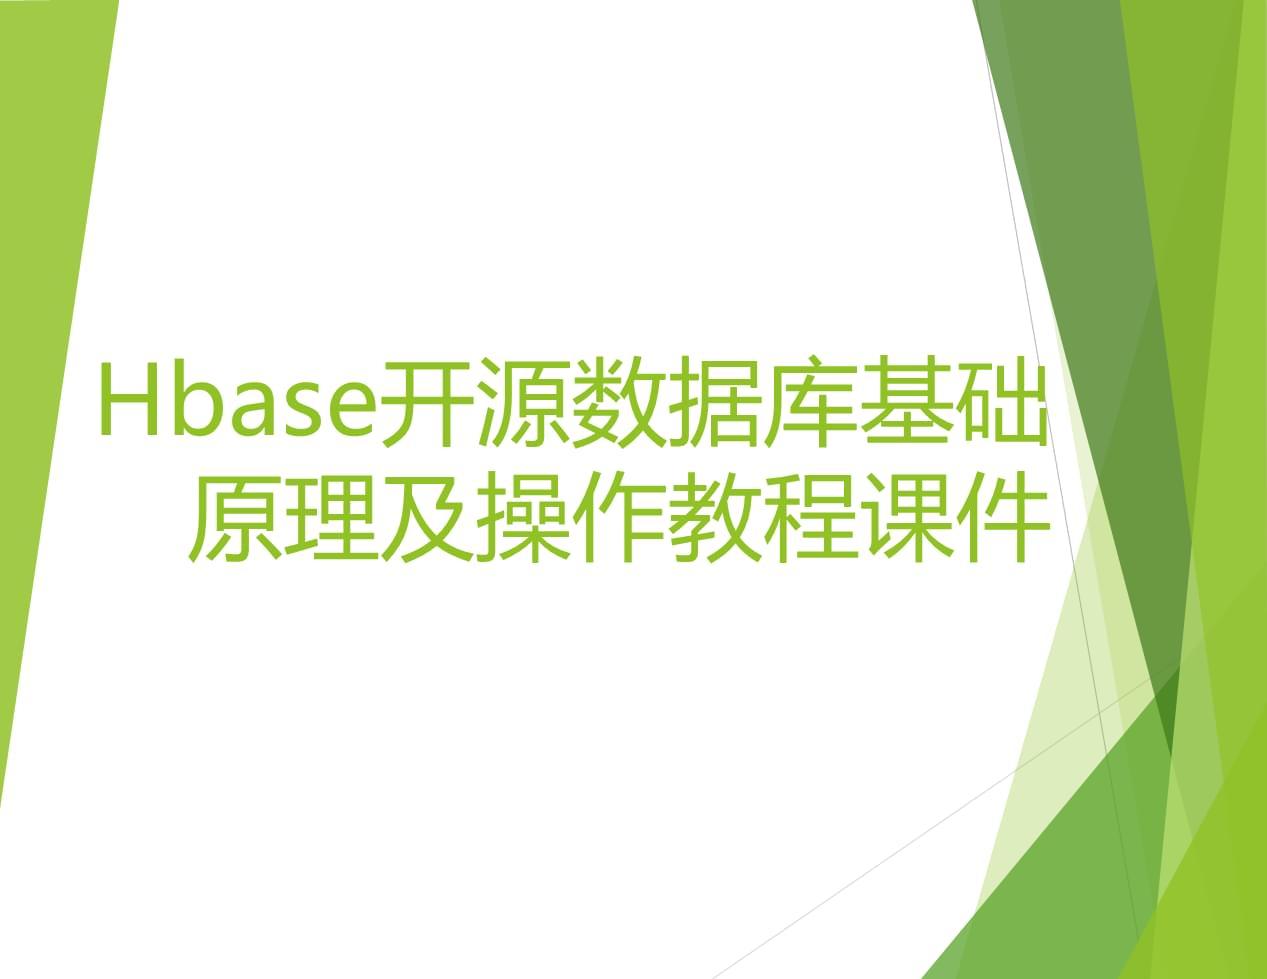 Hbase开源数据库基础原理及操作教程课件.pptx